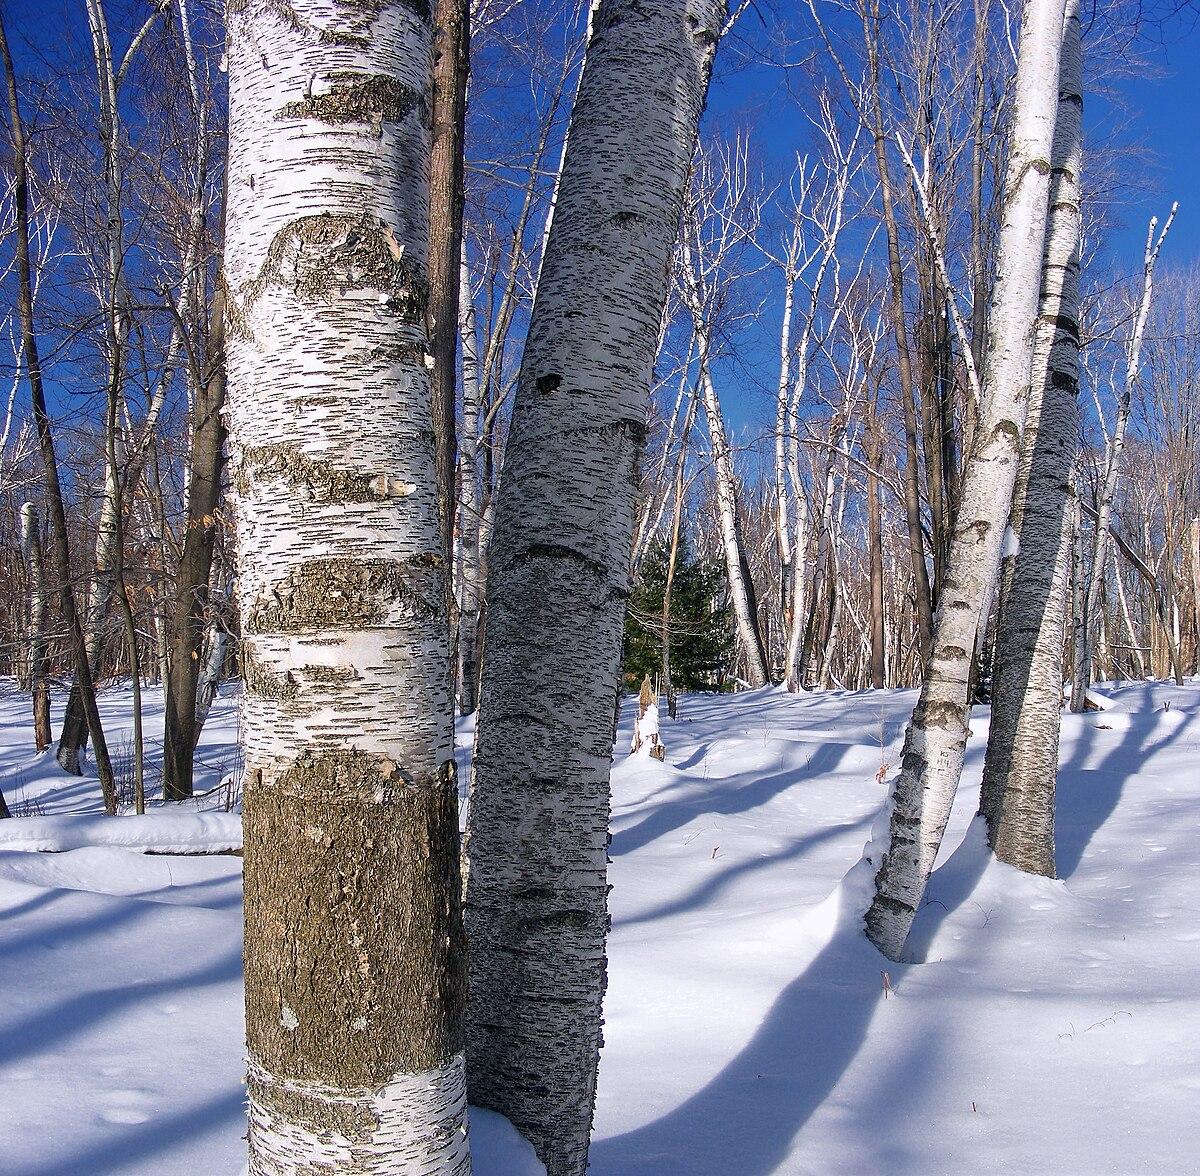 Quehanna Wild Area - Wikipedia